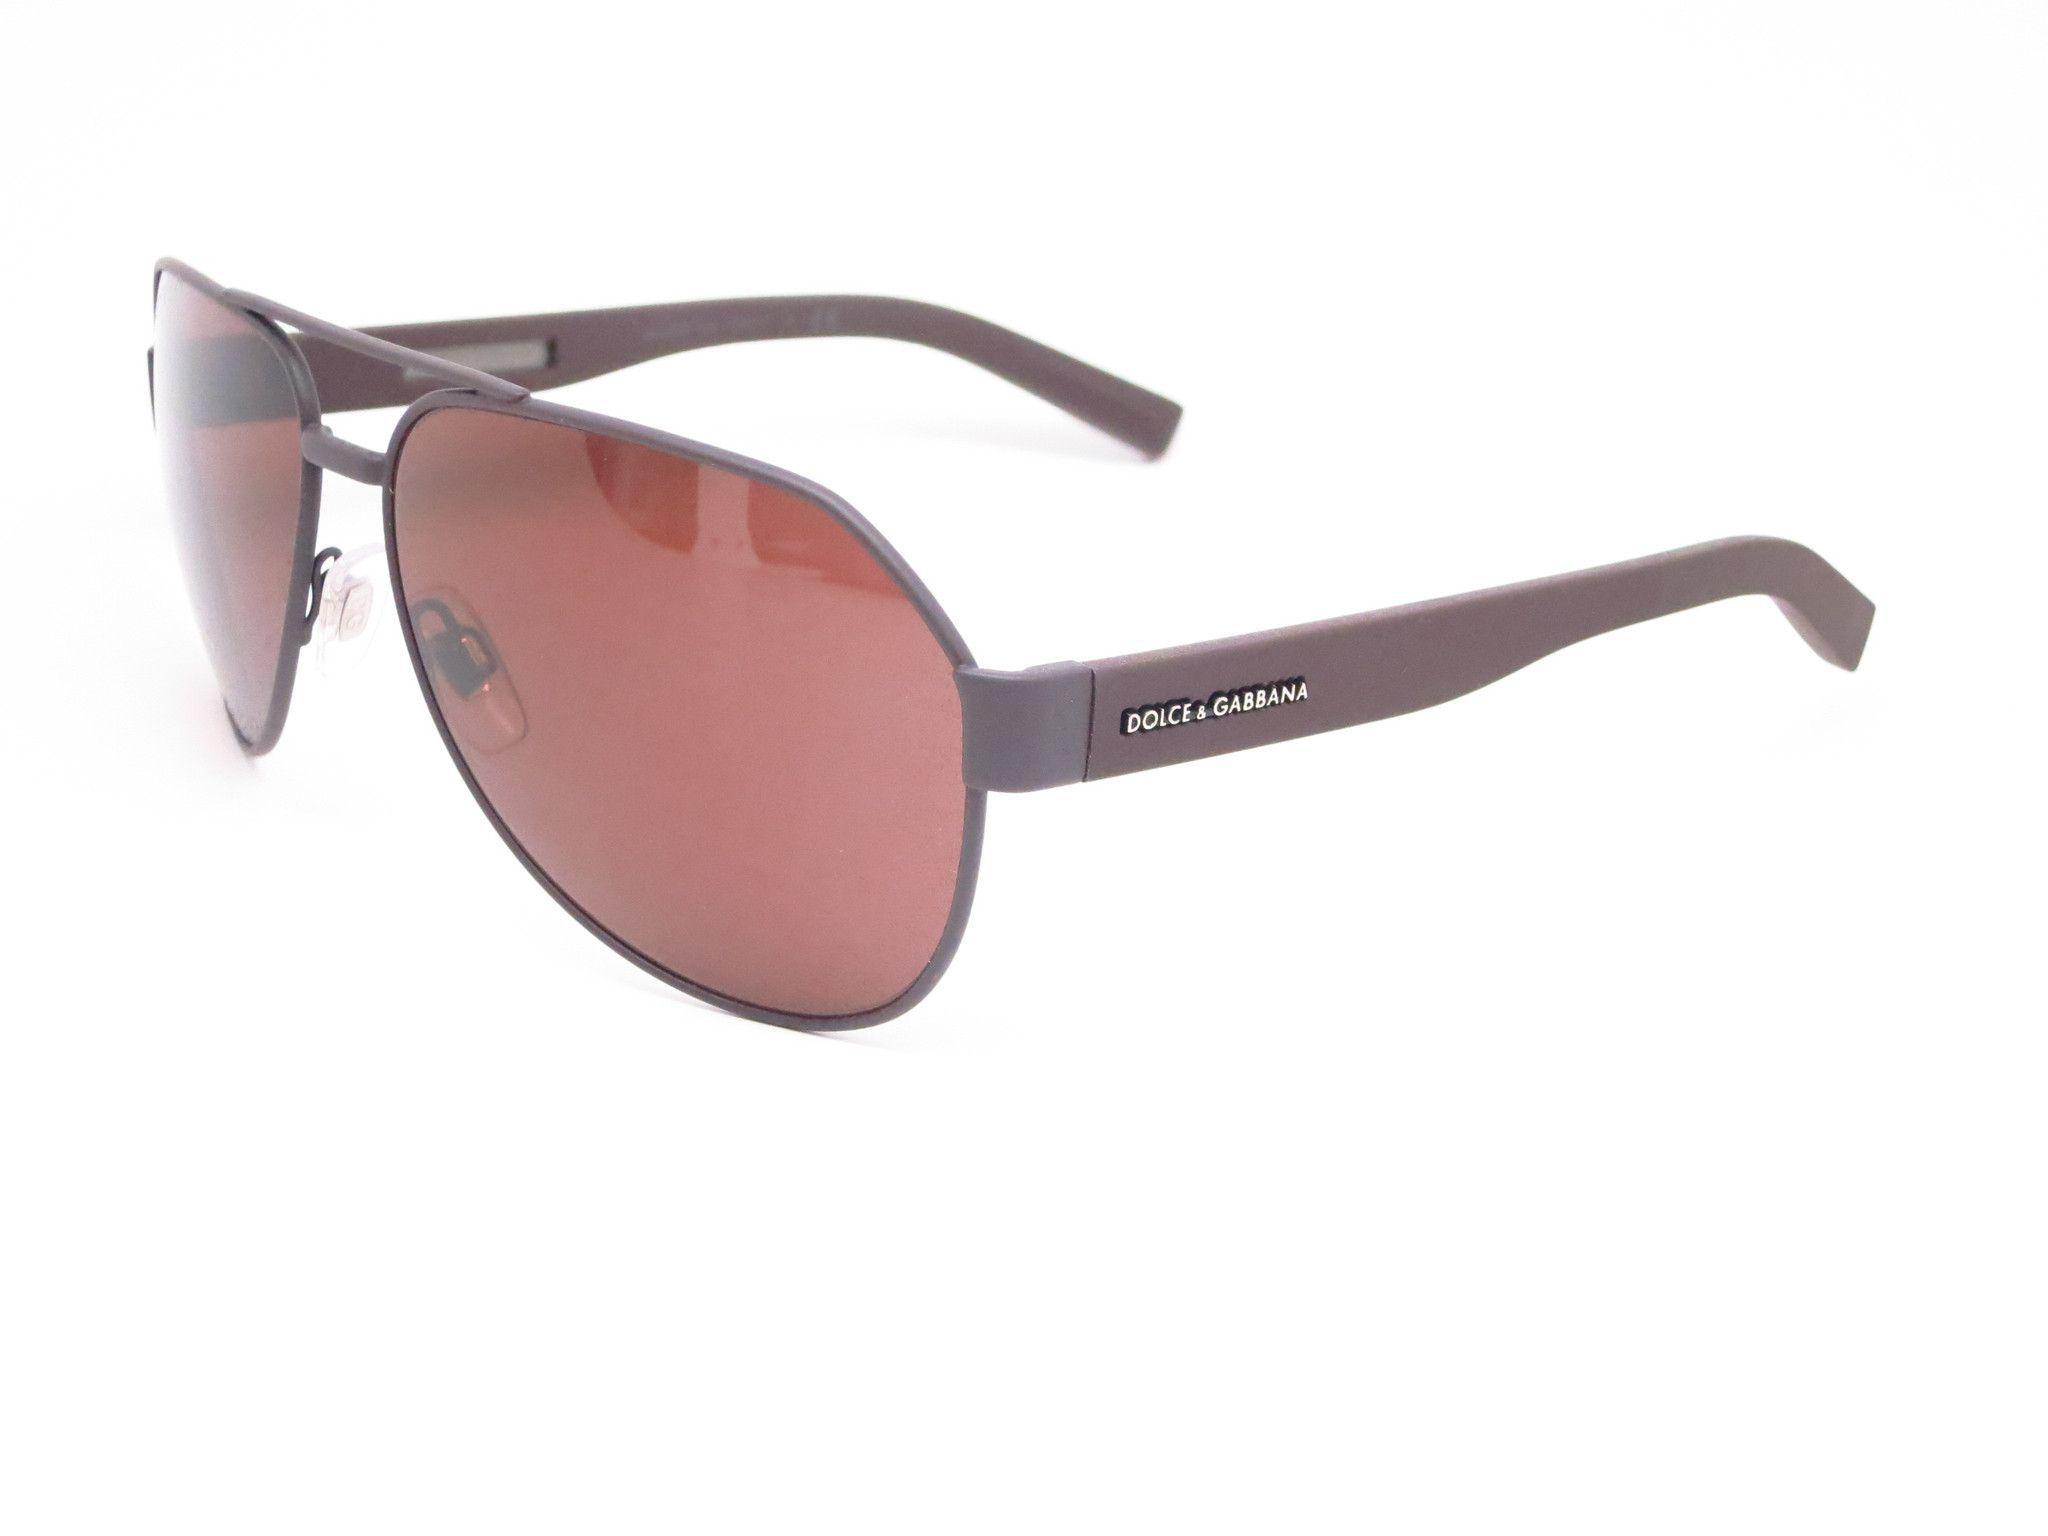 f11ae09b4aa Dolce   Gabbana DG 2149 1274 73 Brown Rubber Sunglasses